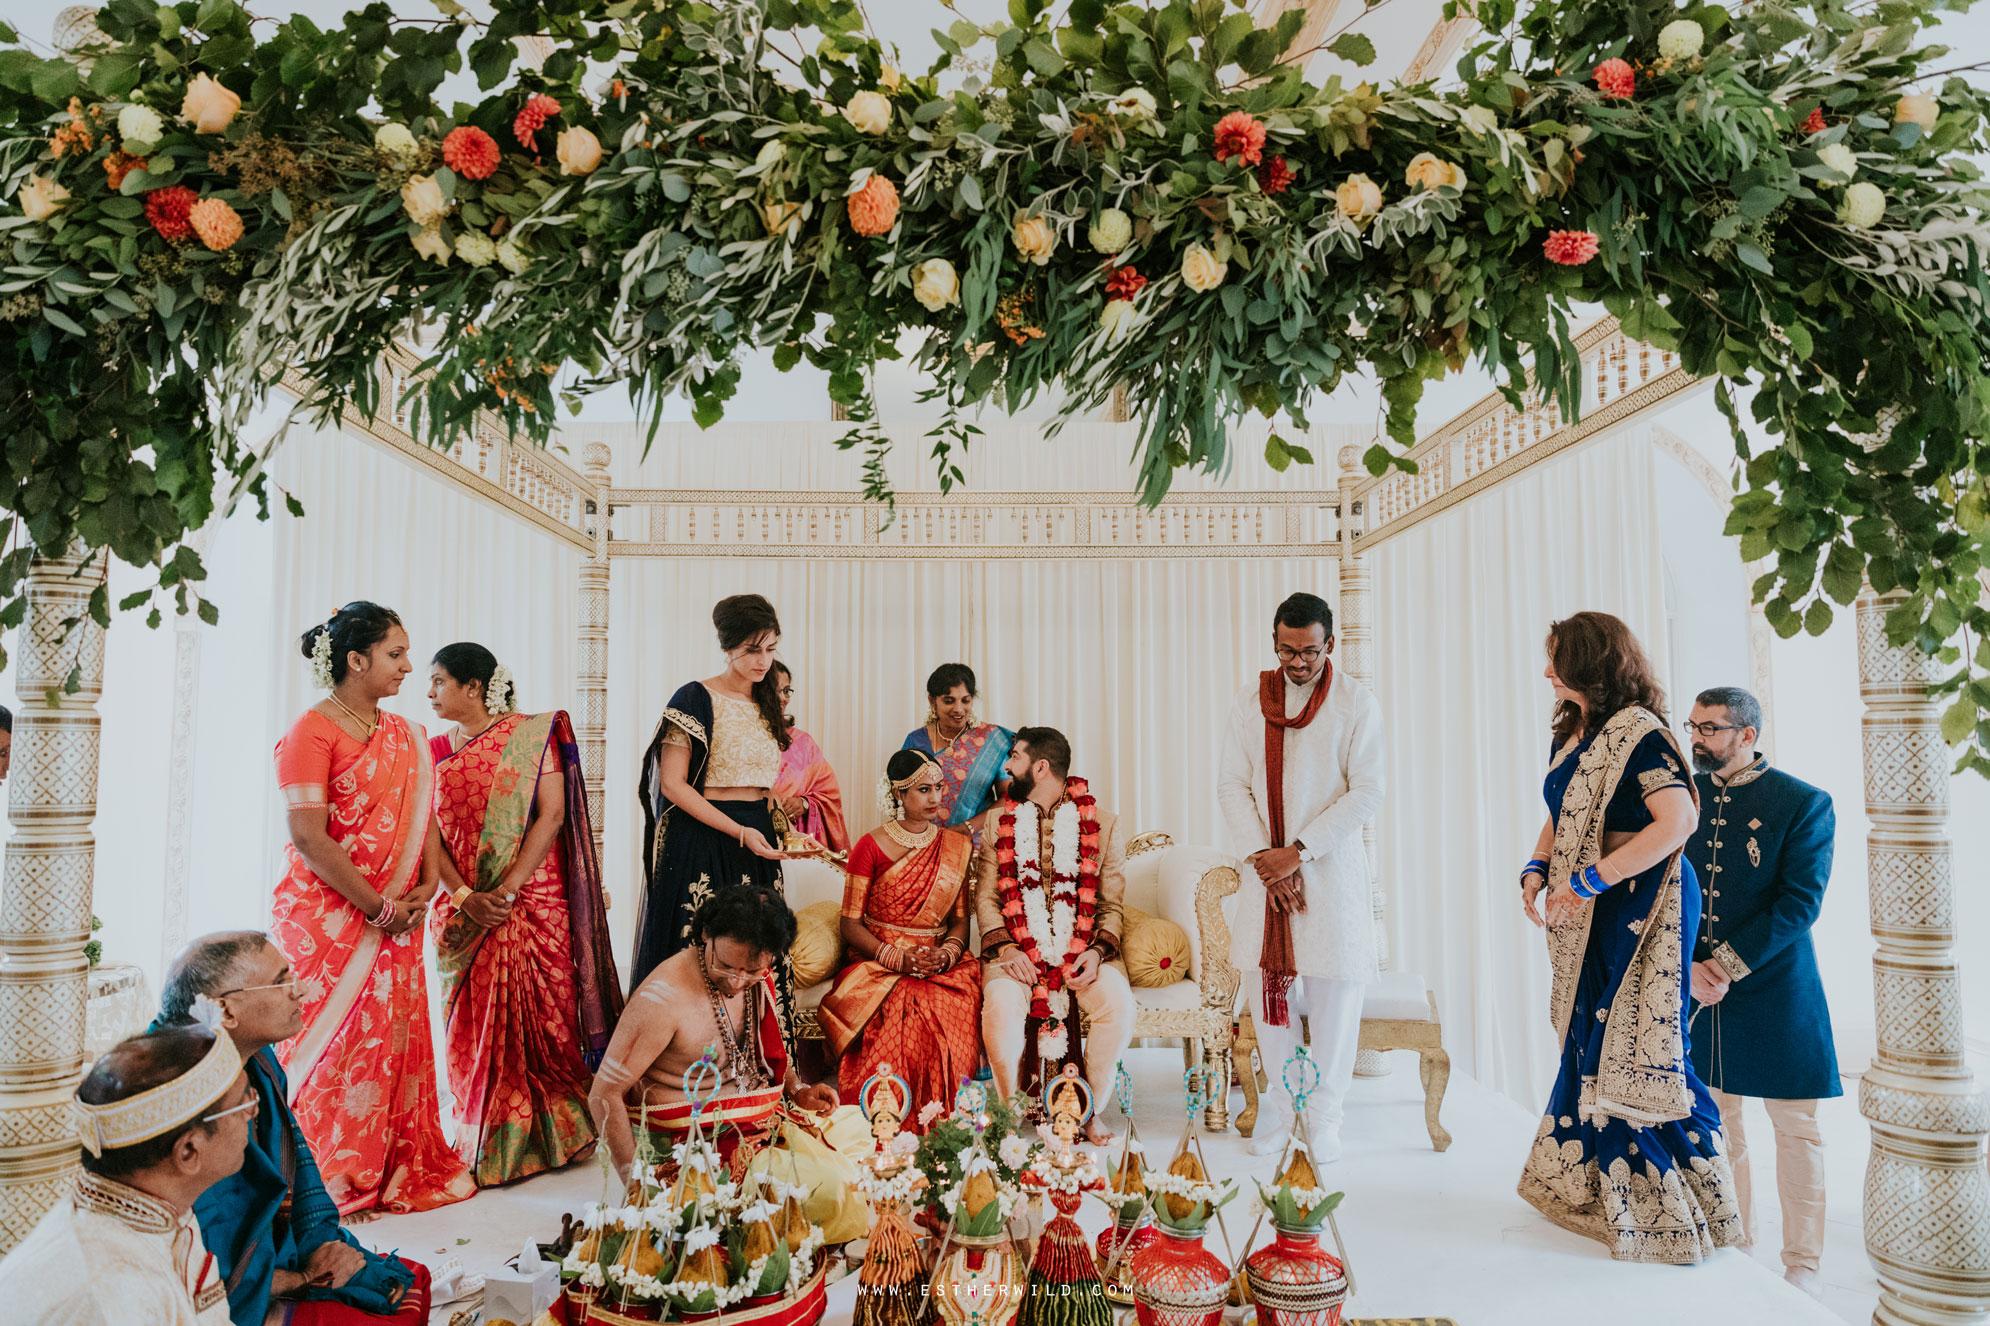 Northbrook_Park_Farnham_Surrey_London_Wedding_Hindu_Fusion_Esther_Wild_Photographer_IMG_4467.jpg